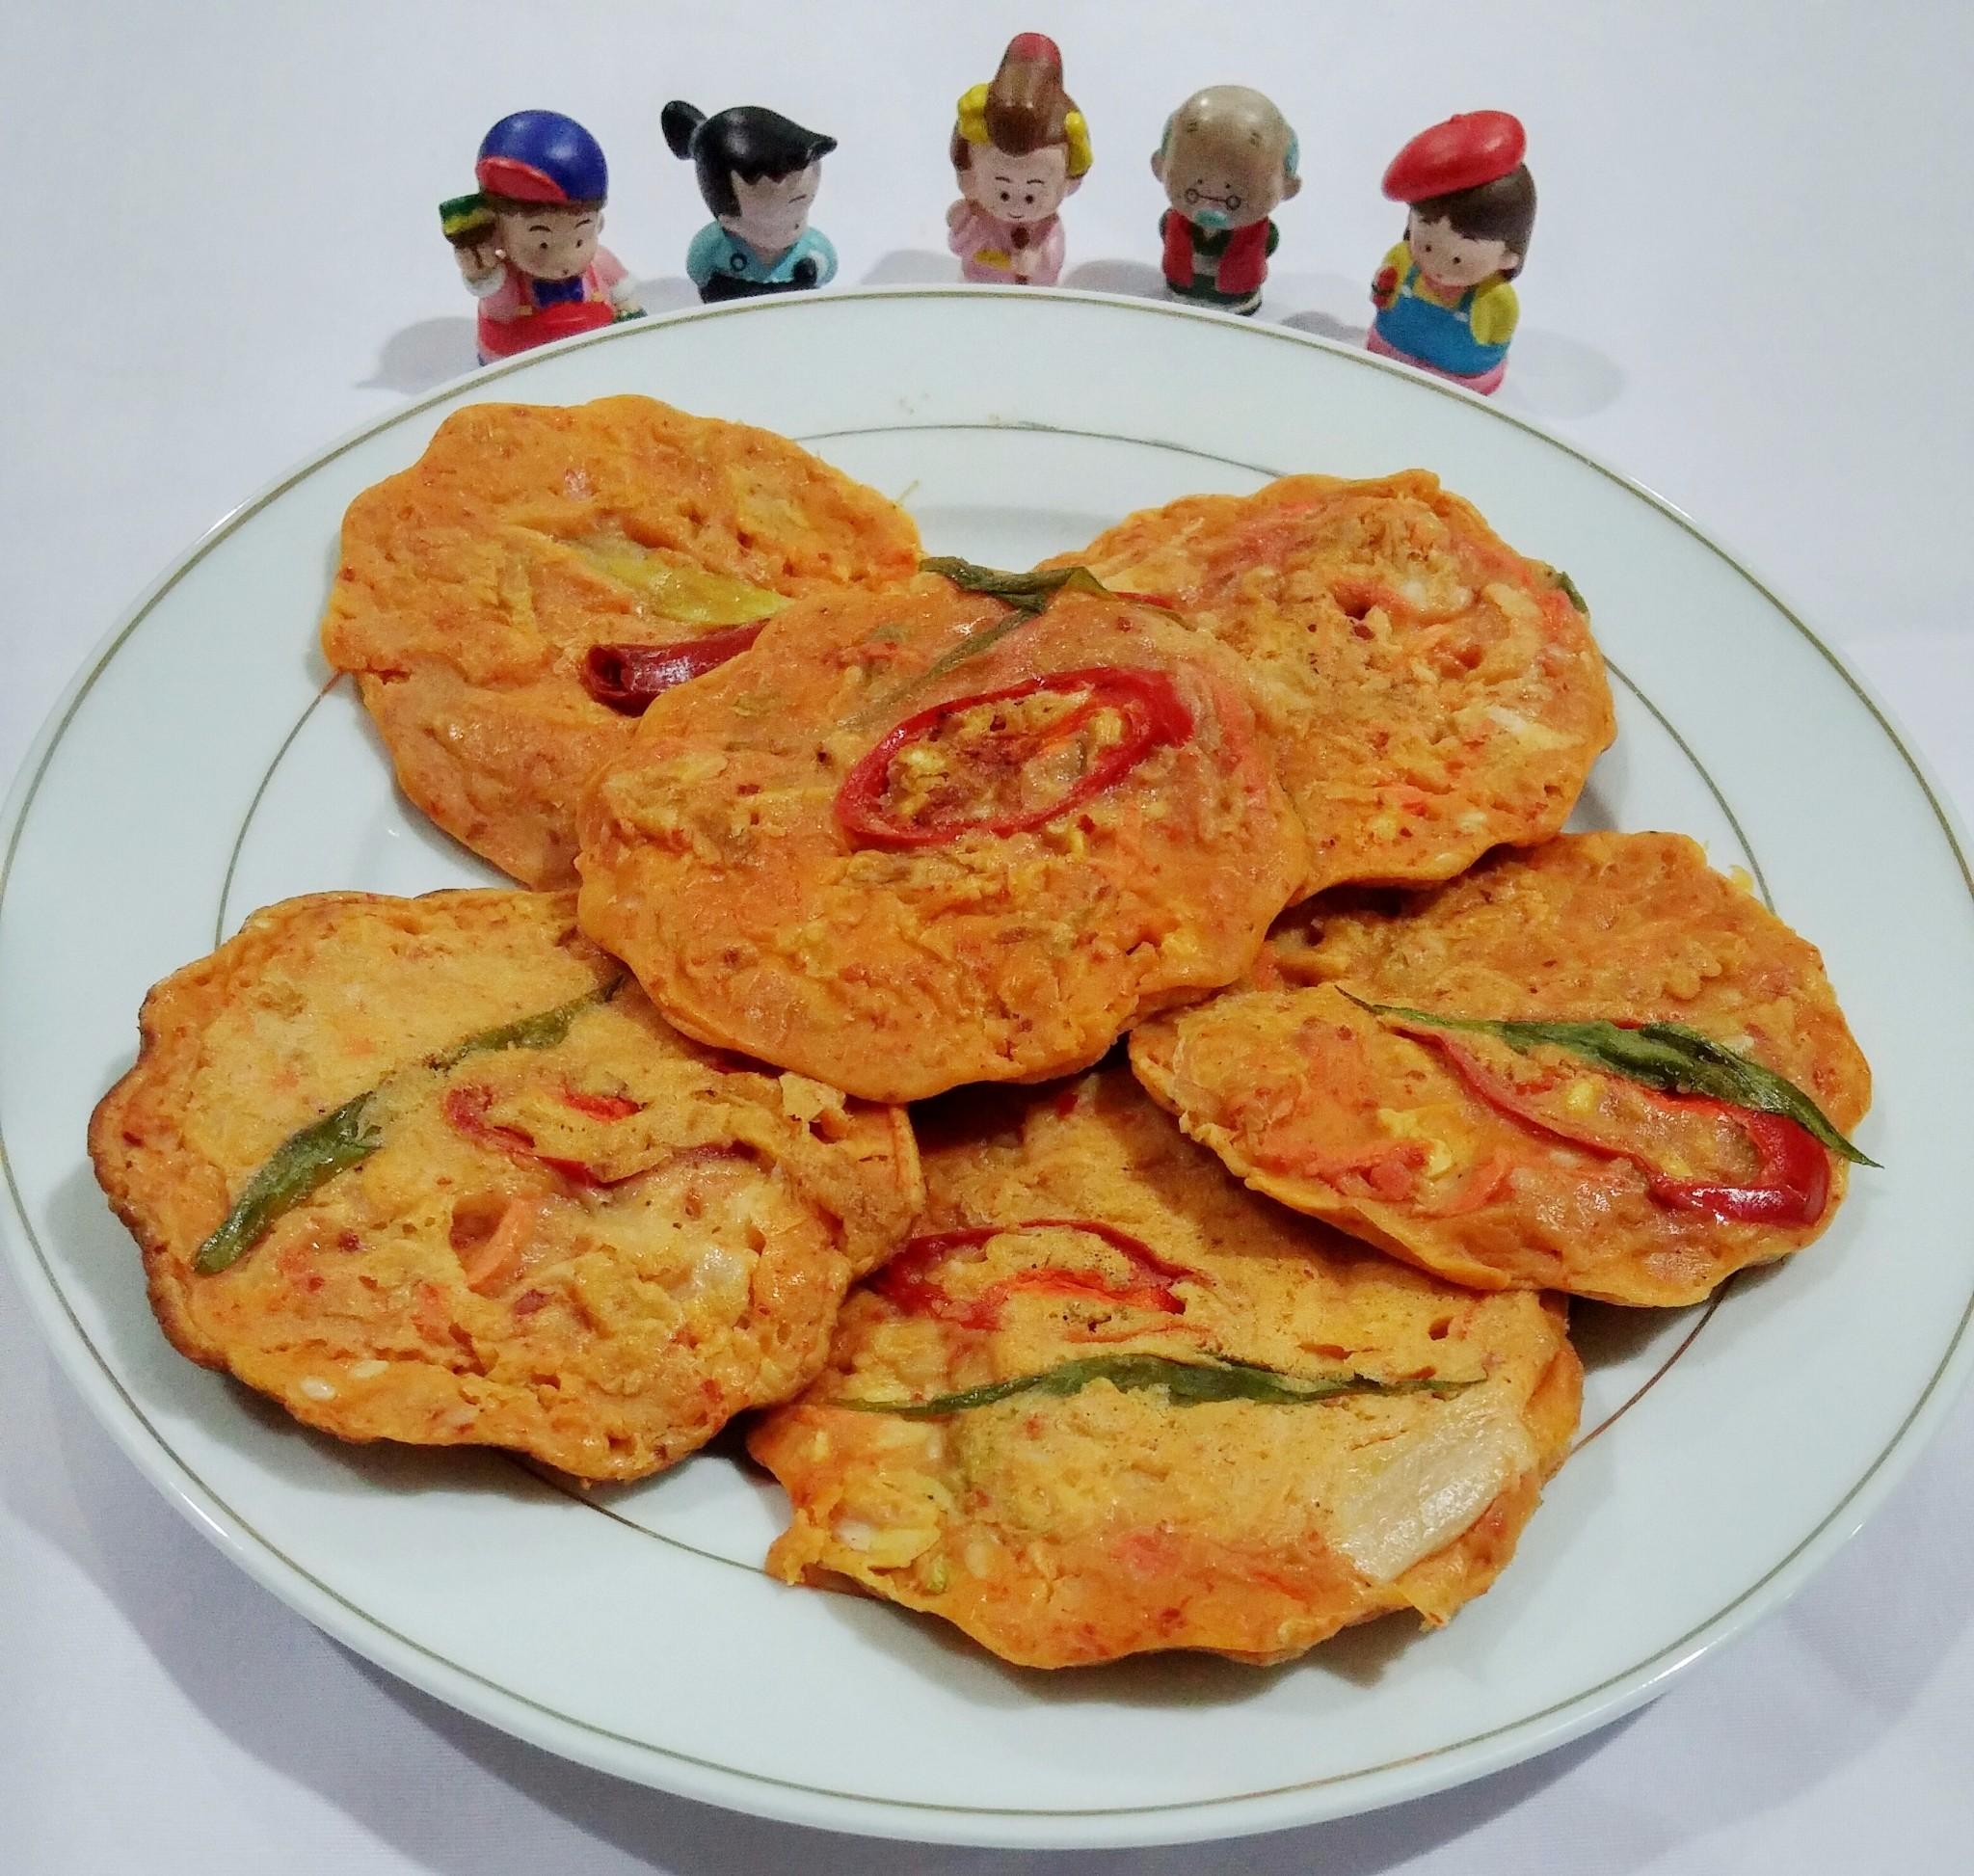 Jual Kimchi Pajeon [Pancake Korea] - Oma Kimchi | Tokopedia